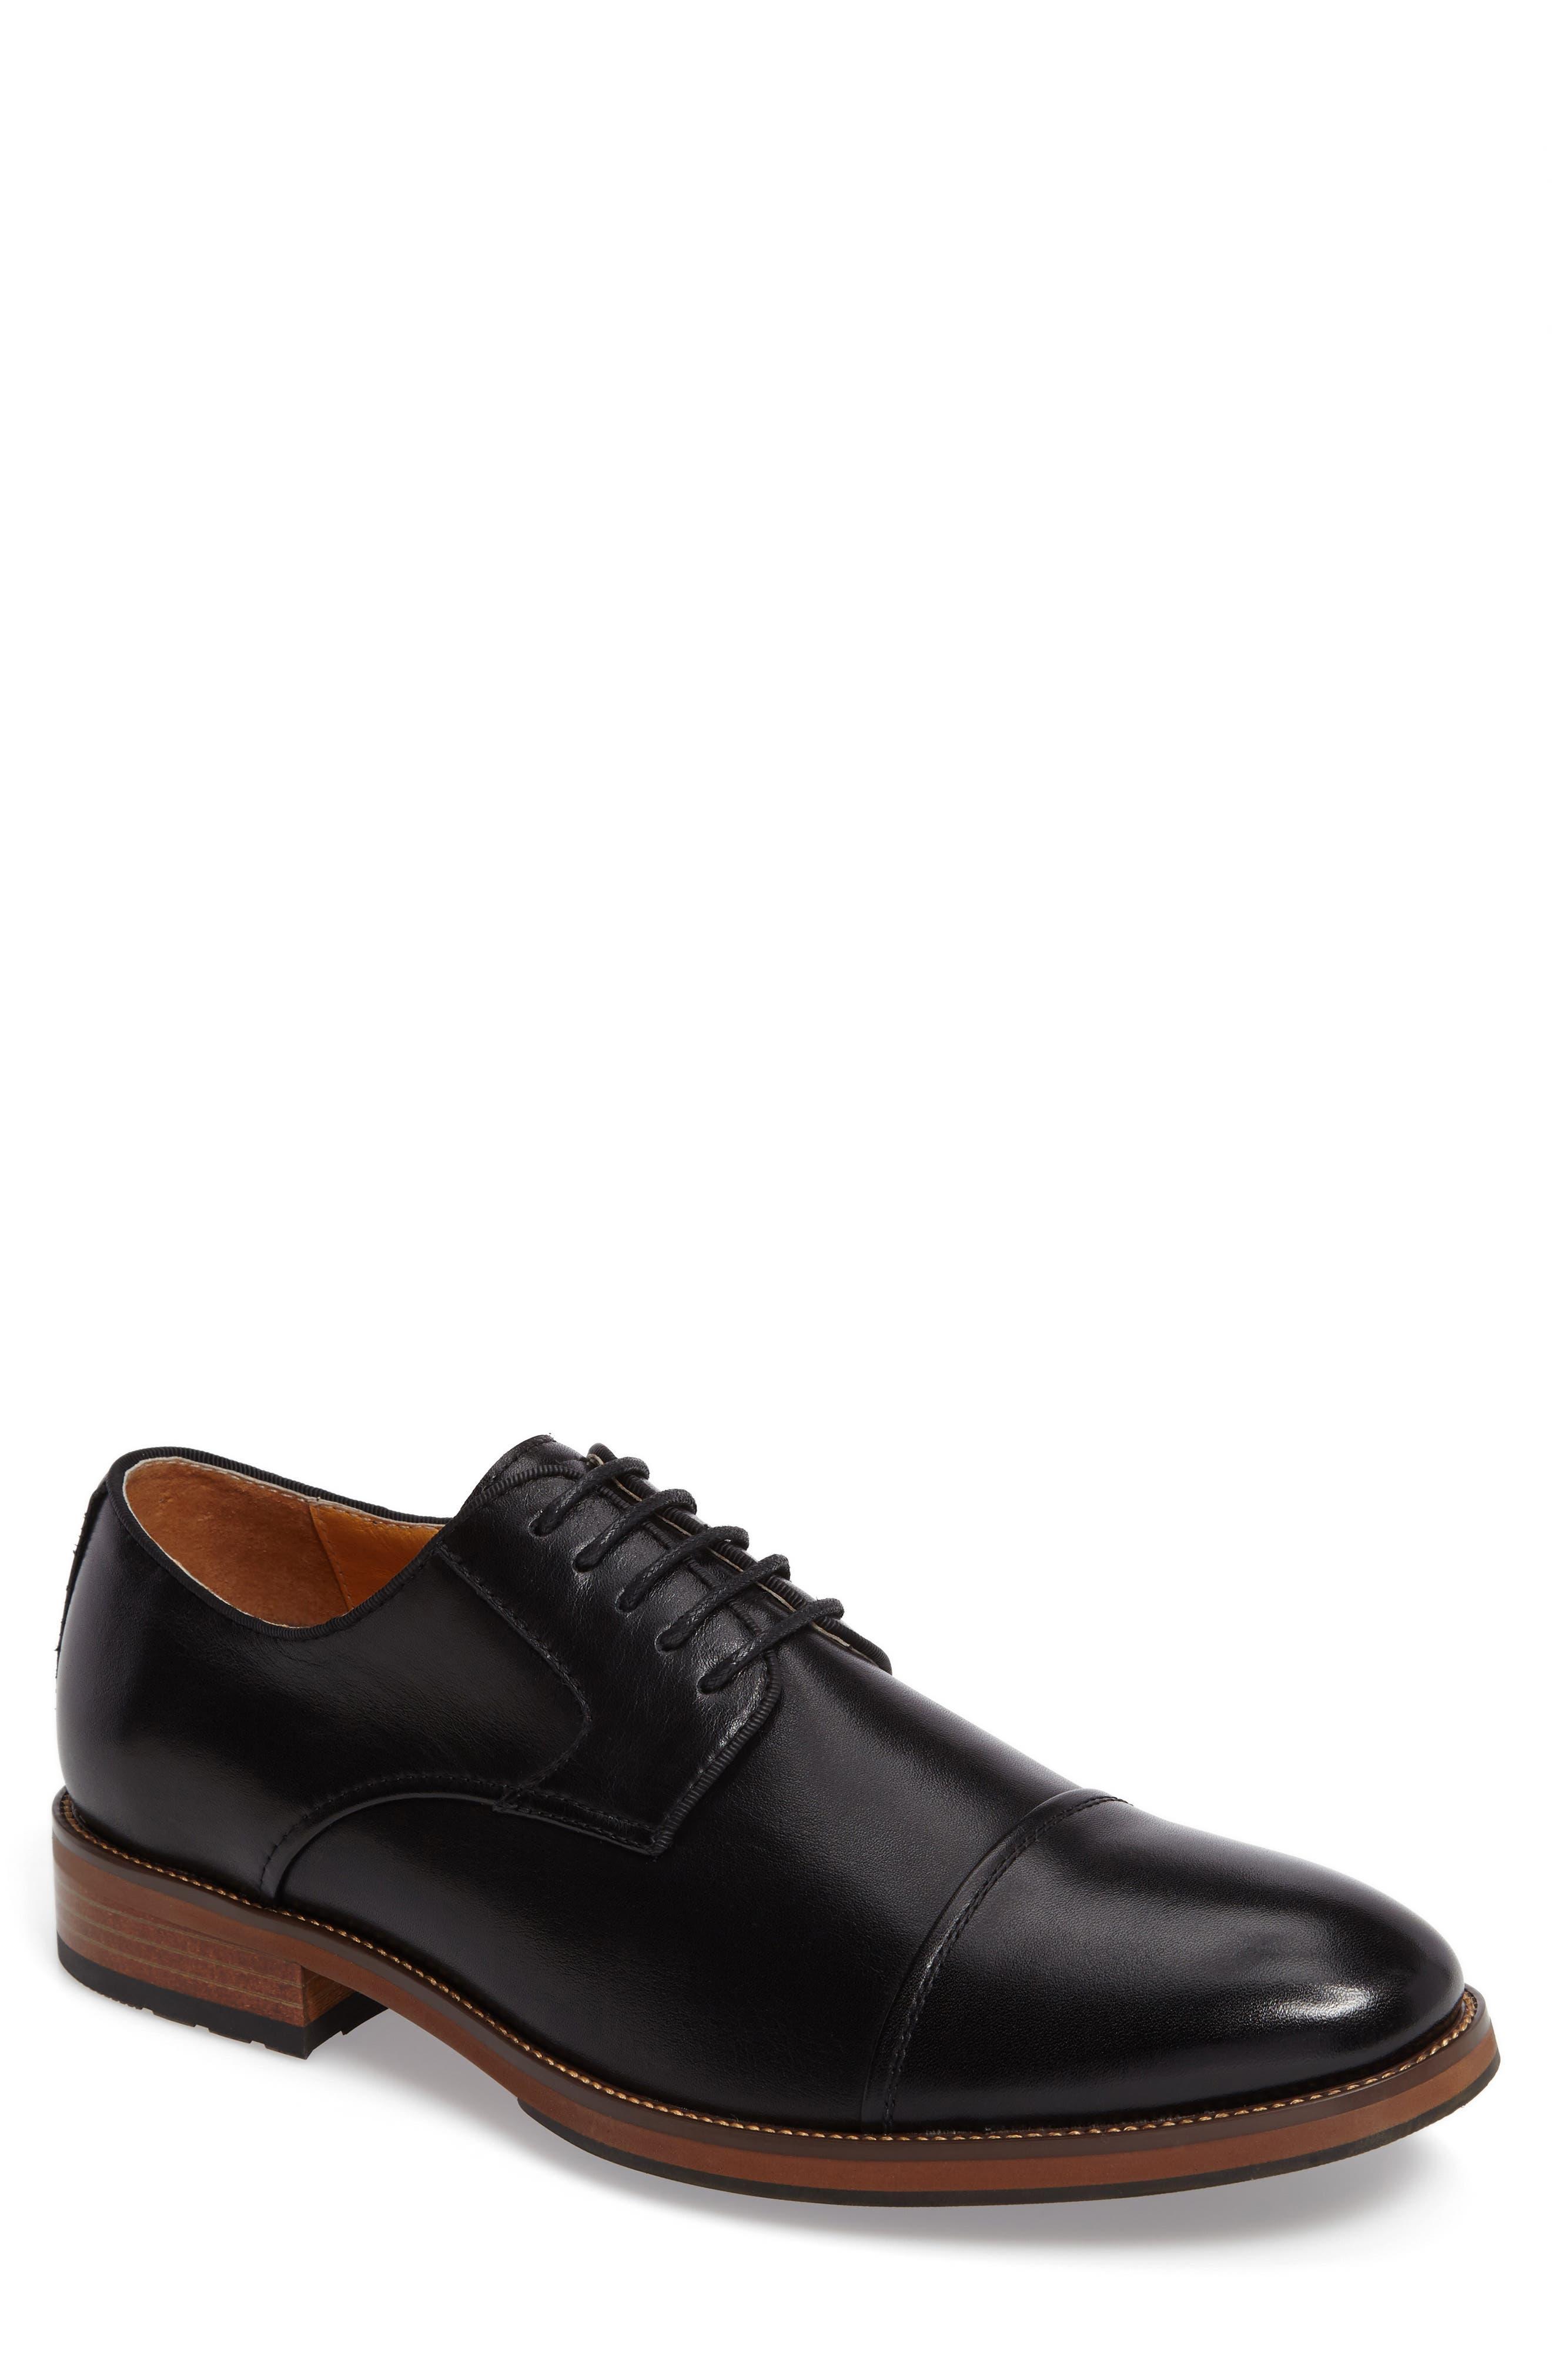 Blaze Cap Toe Derby,                         Main,                         color, Black Leather